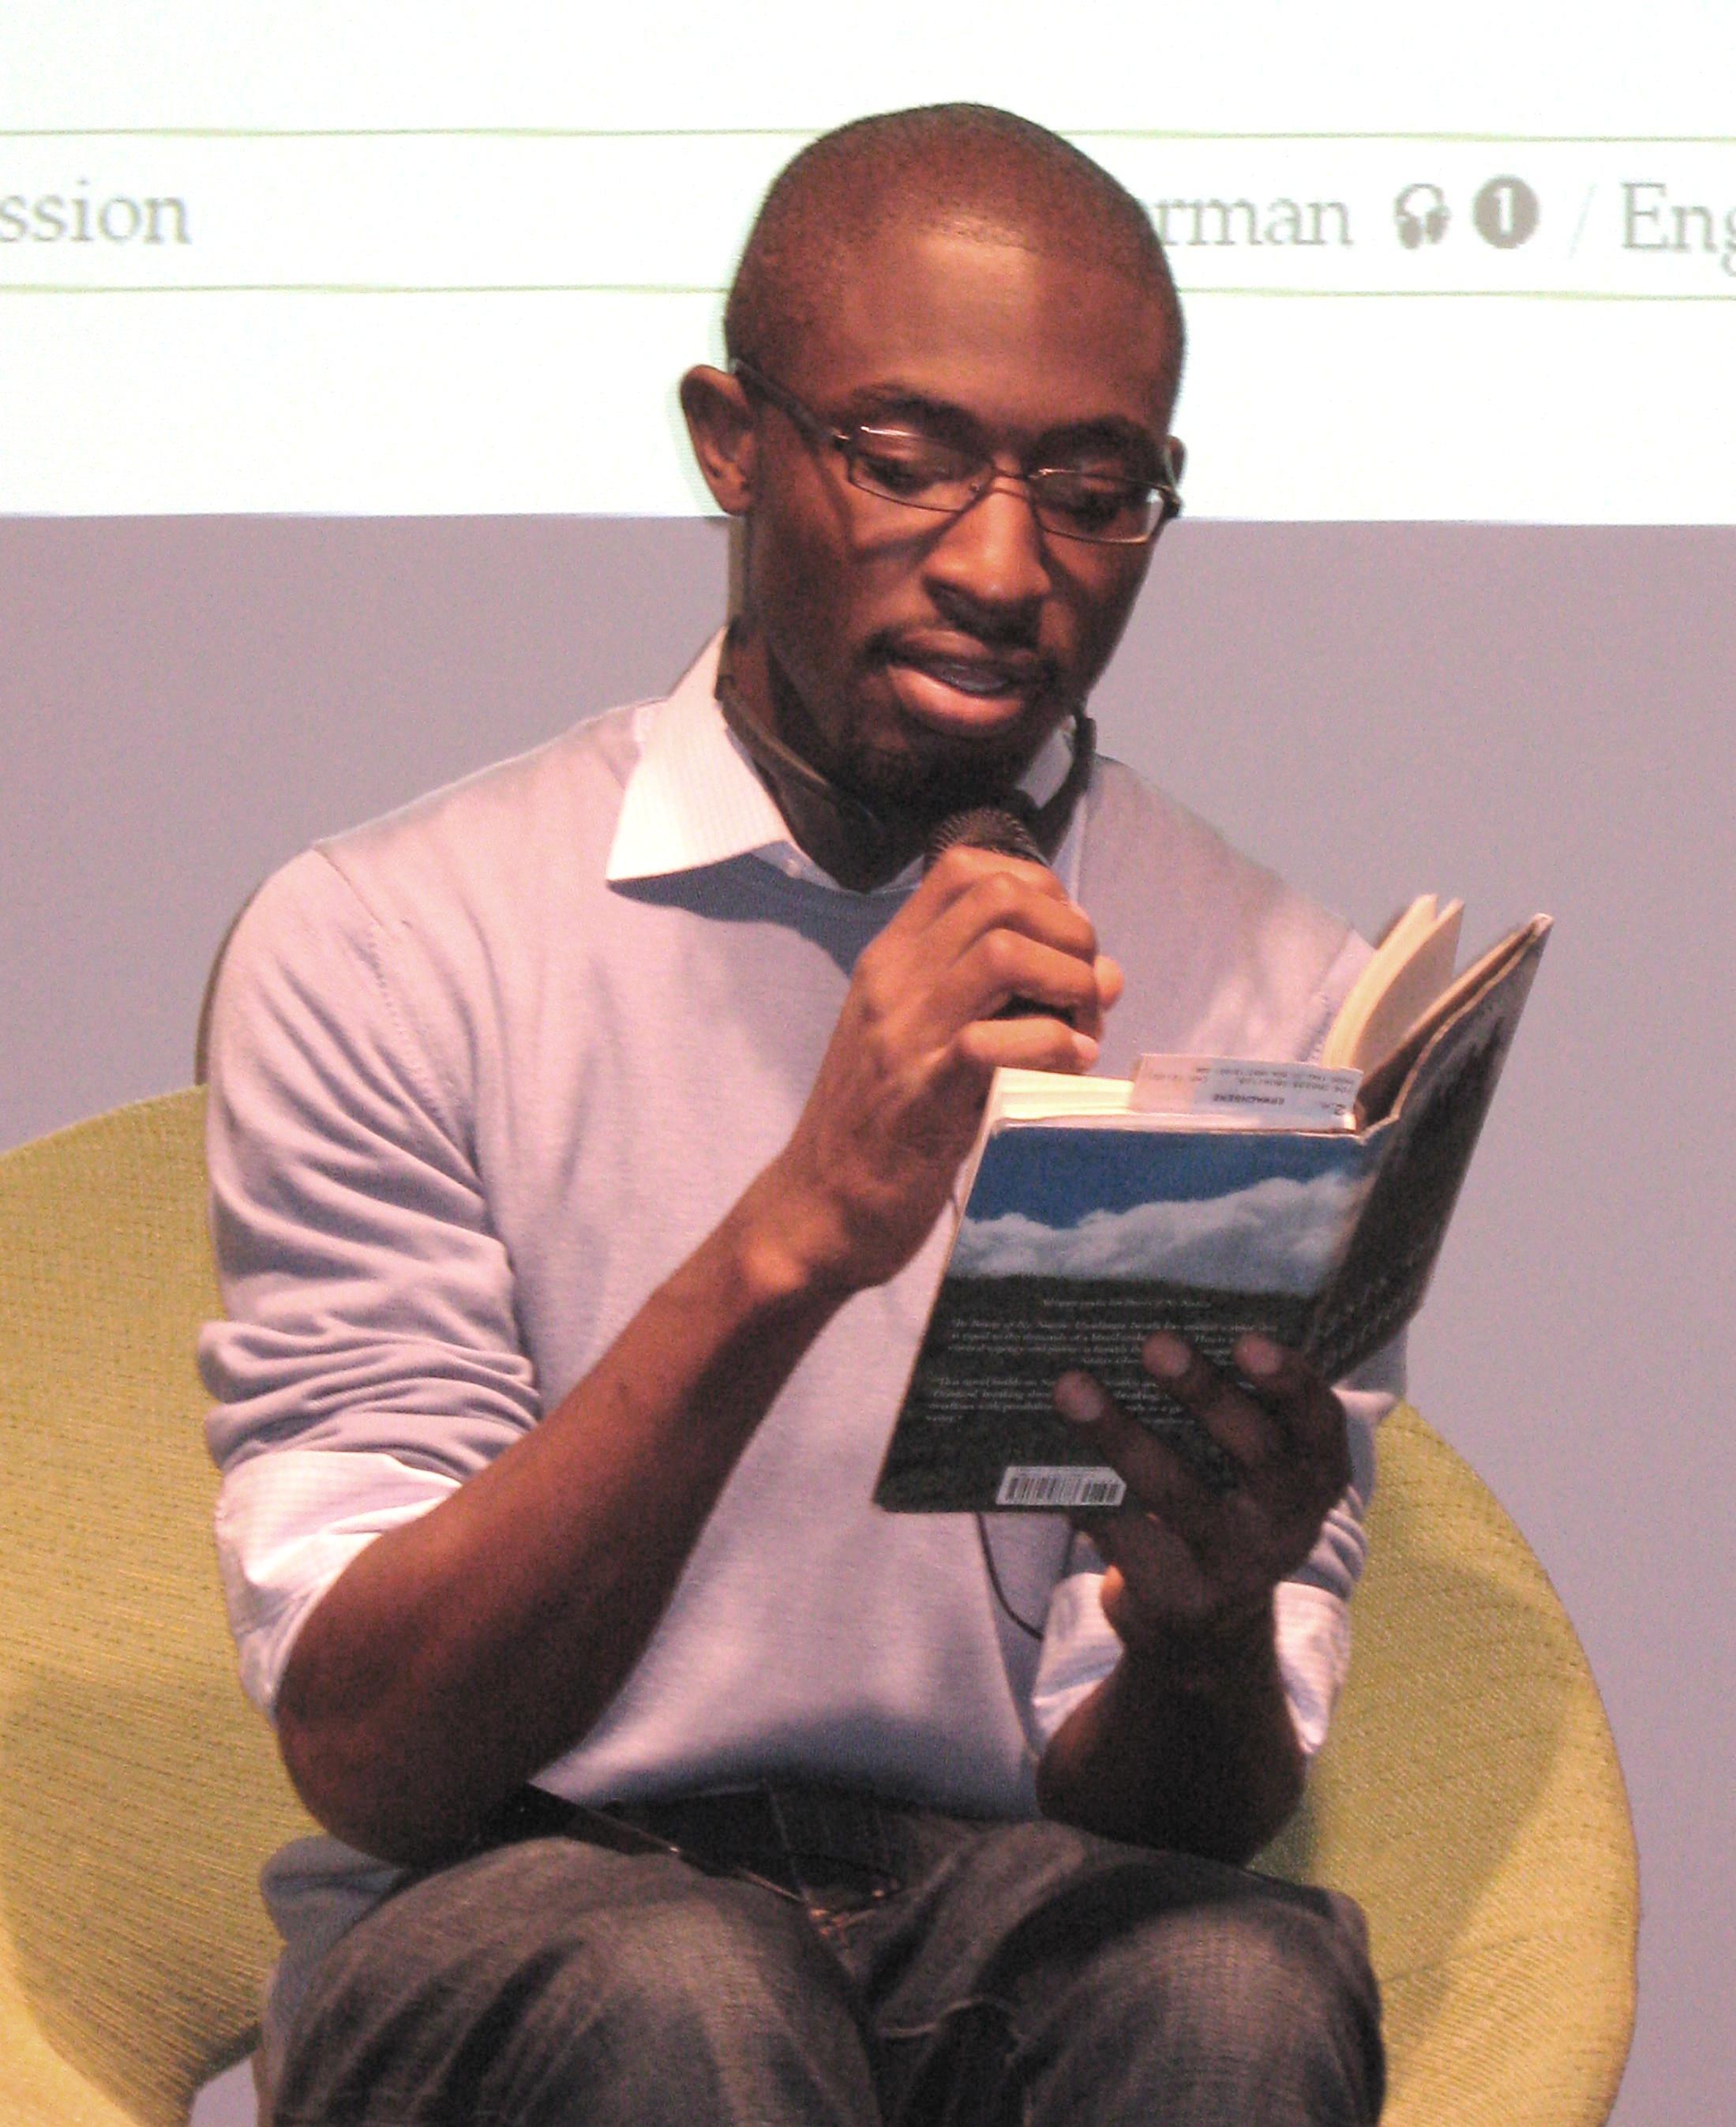 Uzodinma Iweala during a public reading at the [[Frankfurt Book Fair